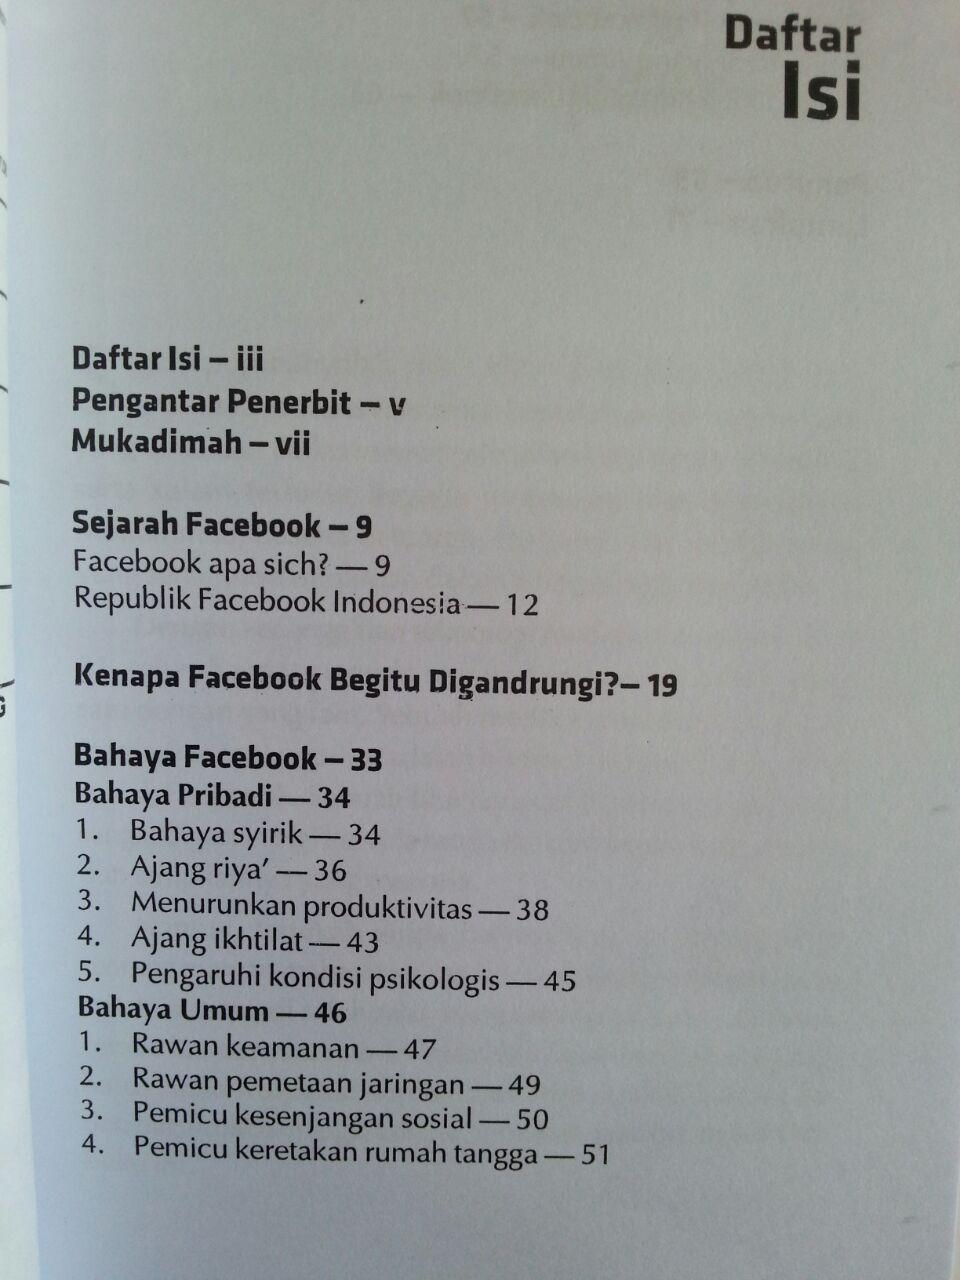 Buku Bahaya Facebook Bagaimana Berfacebook Dengan Aman Sehat Islami isi 2